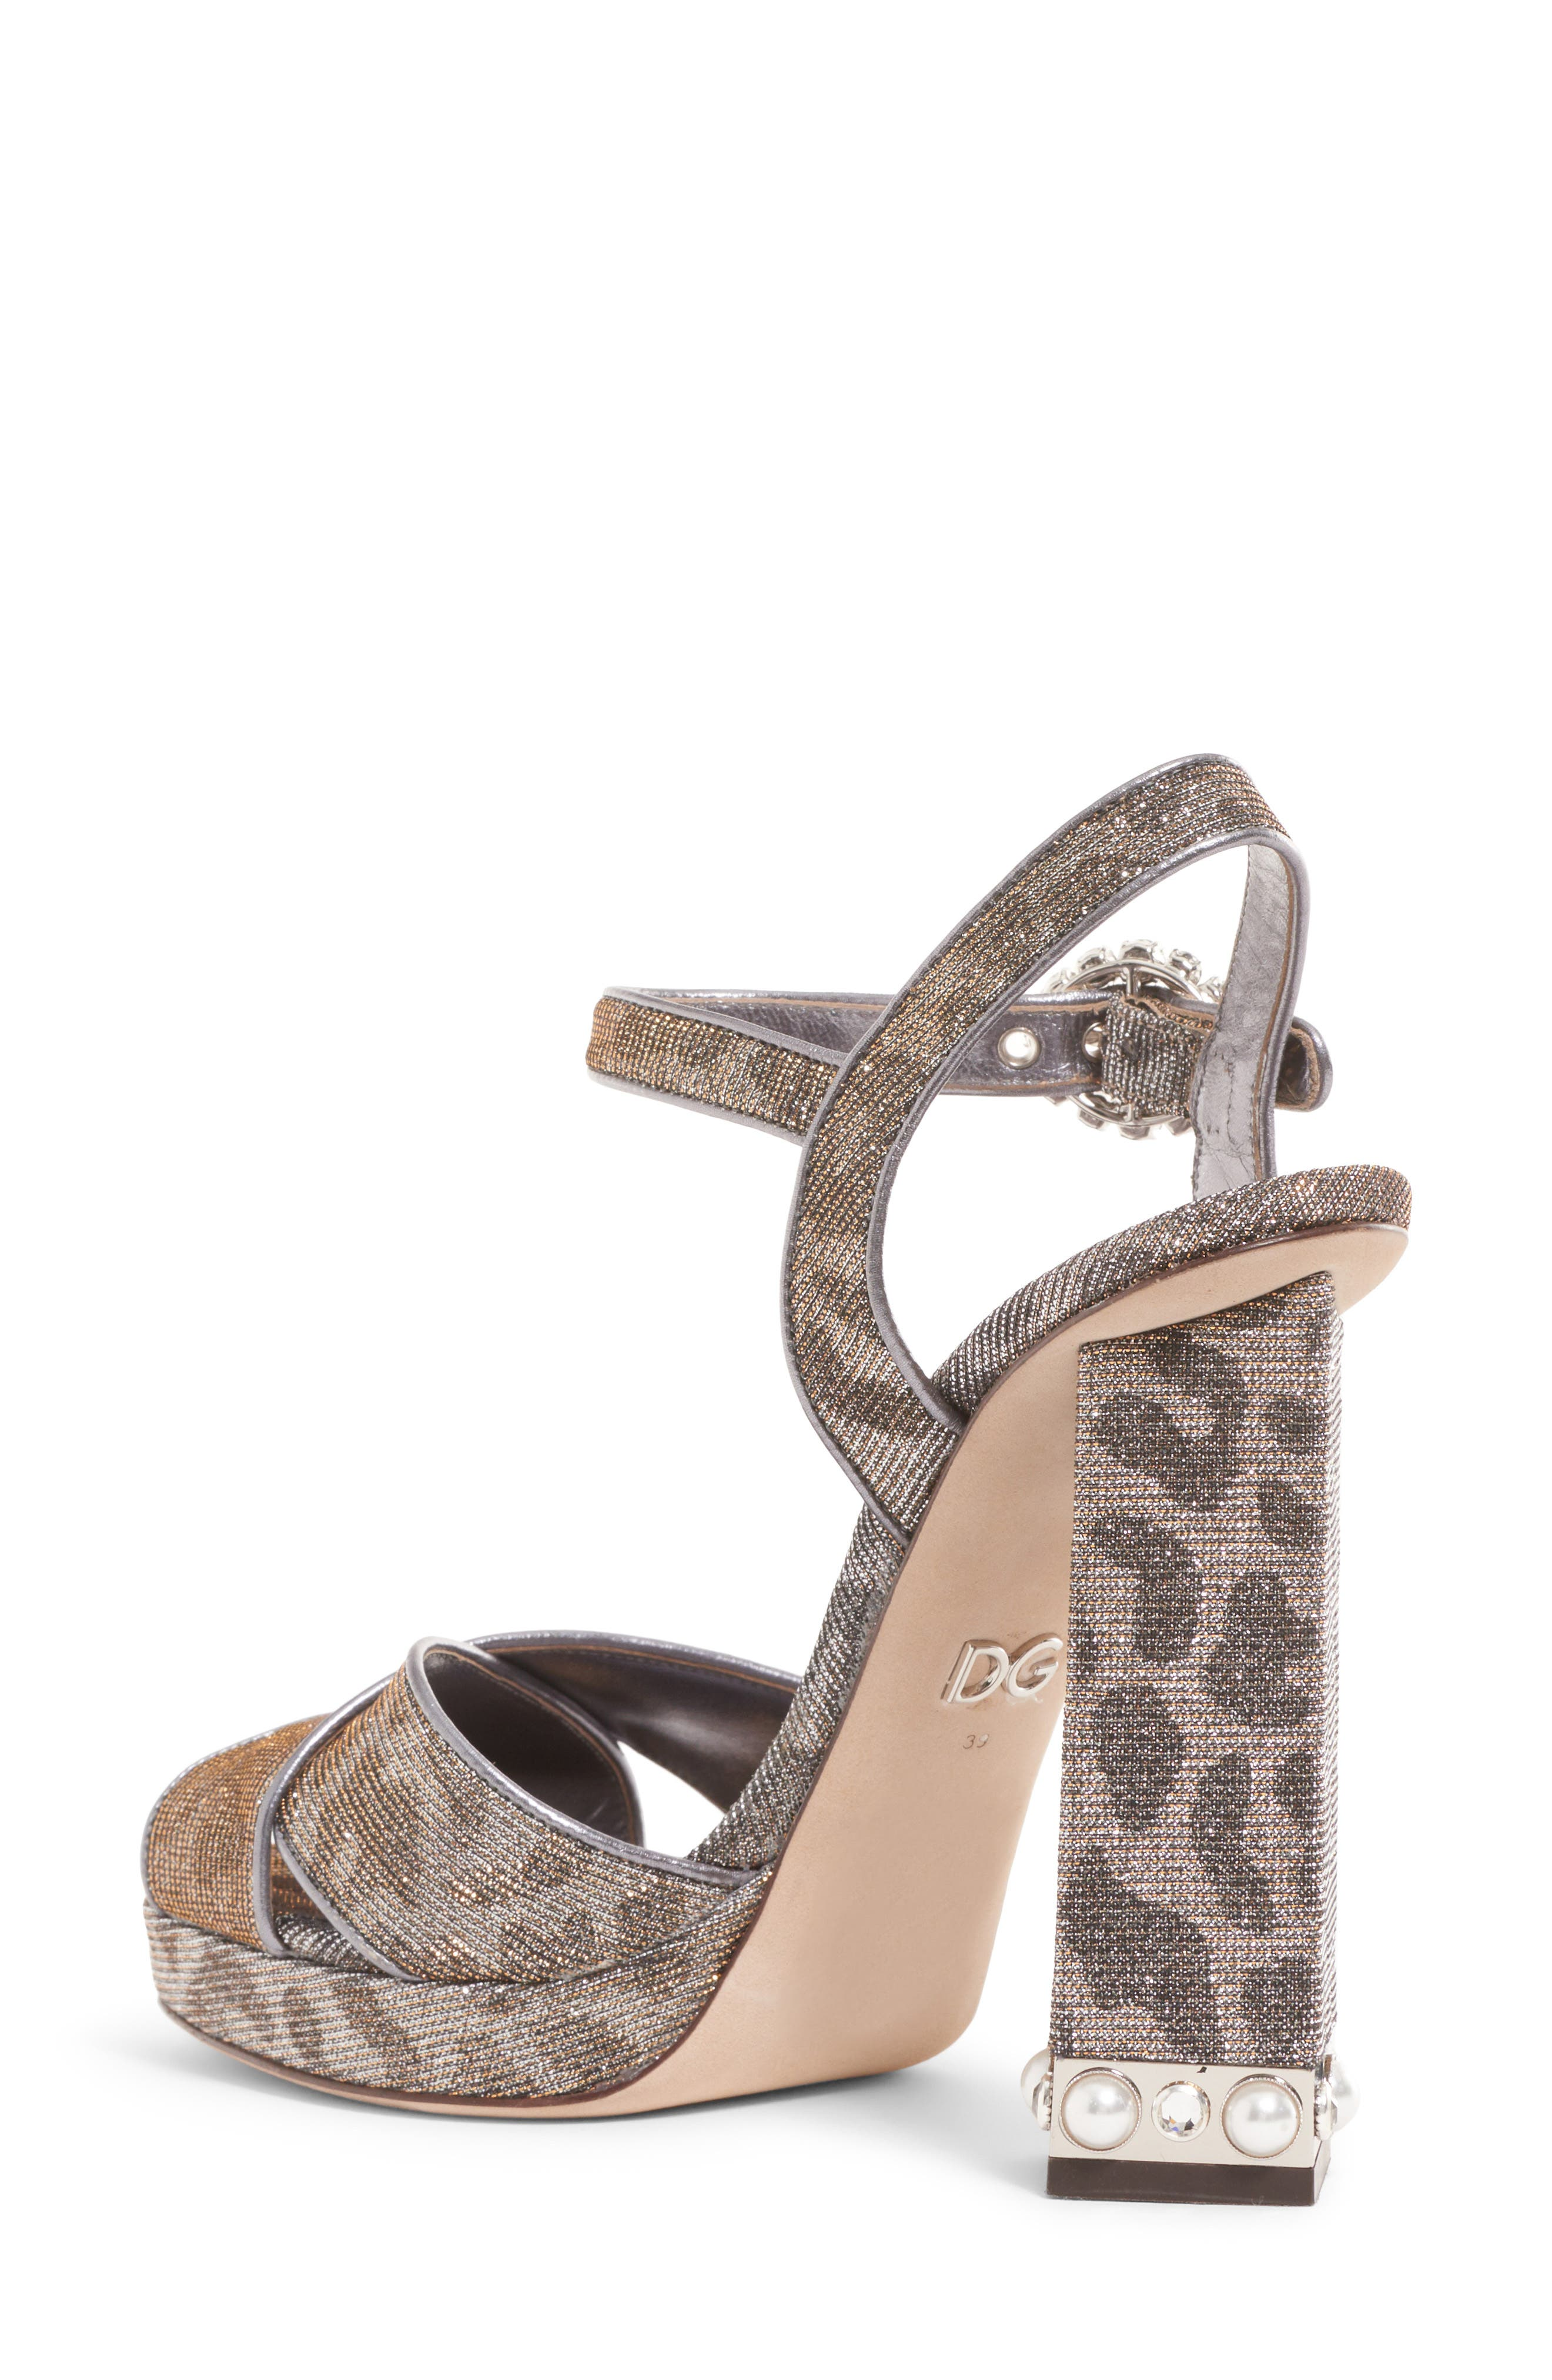 Metallic Leopard Print Sandal,                             Alternate thumbnail 2, color,                             SILVER/ GOLD